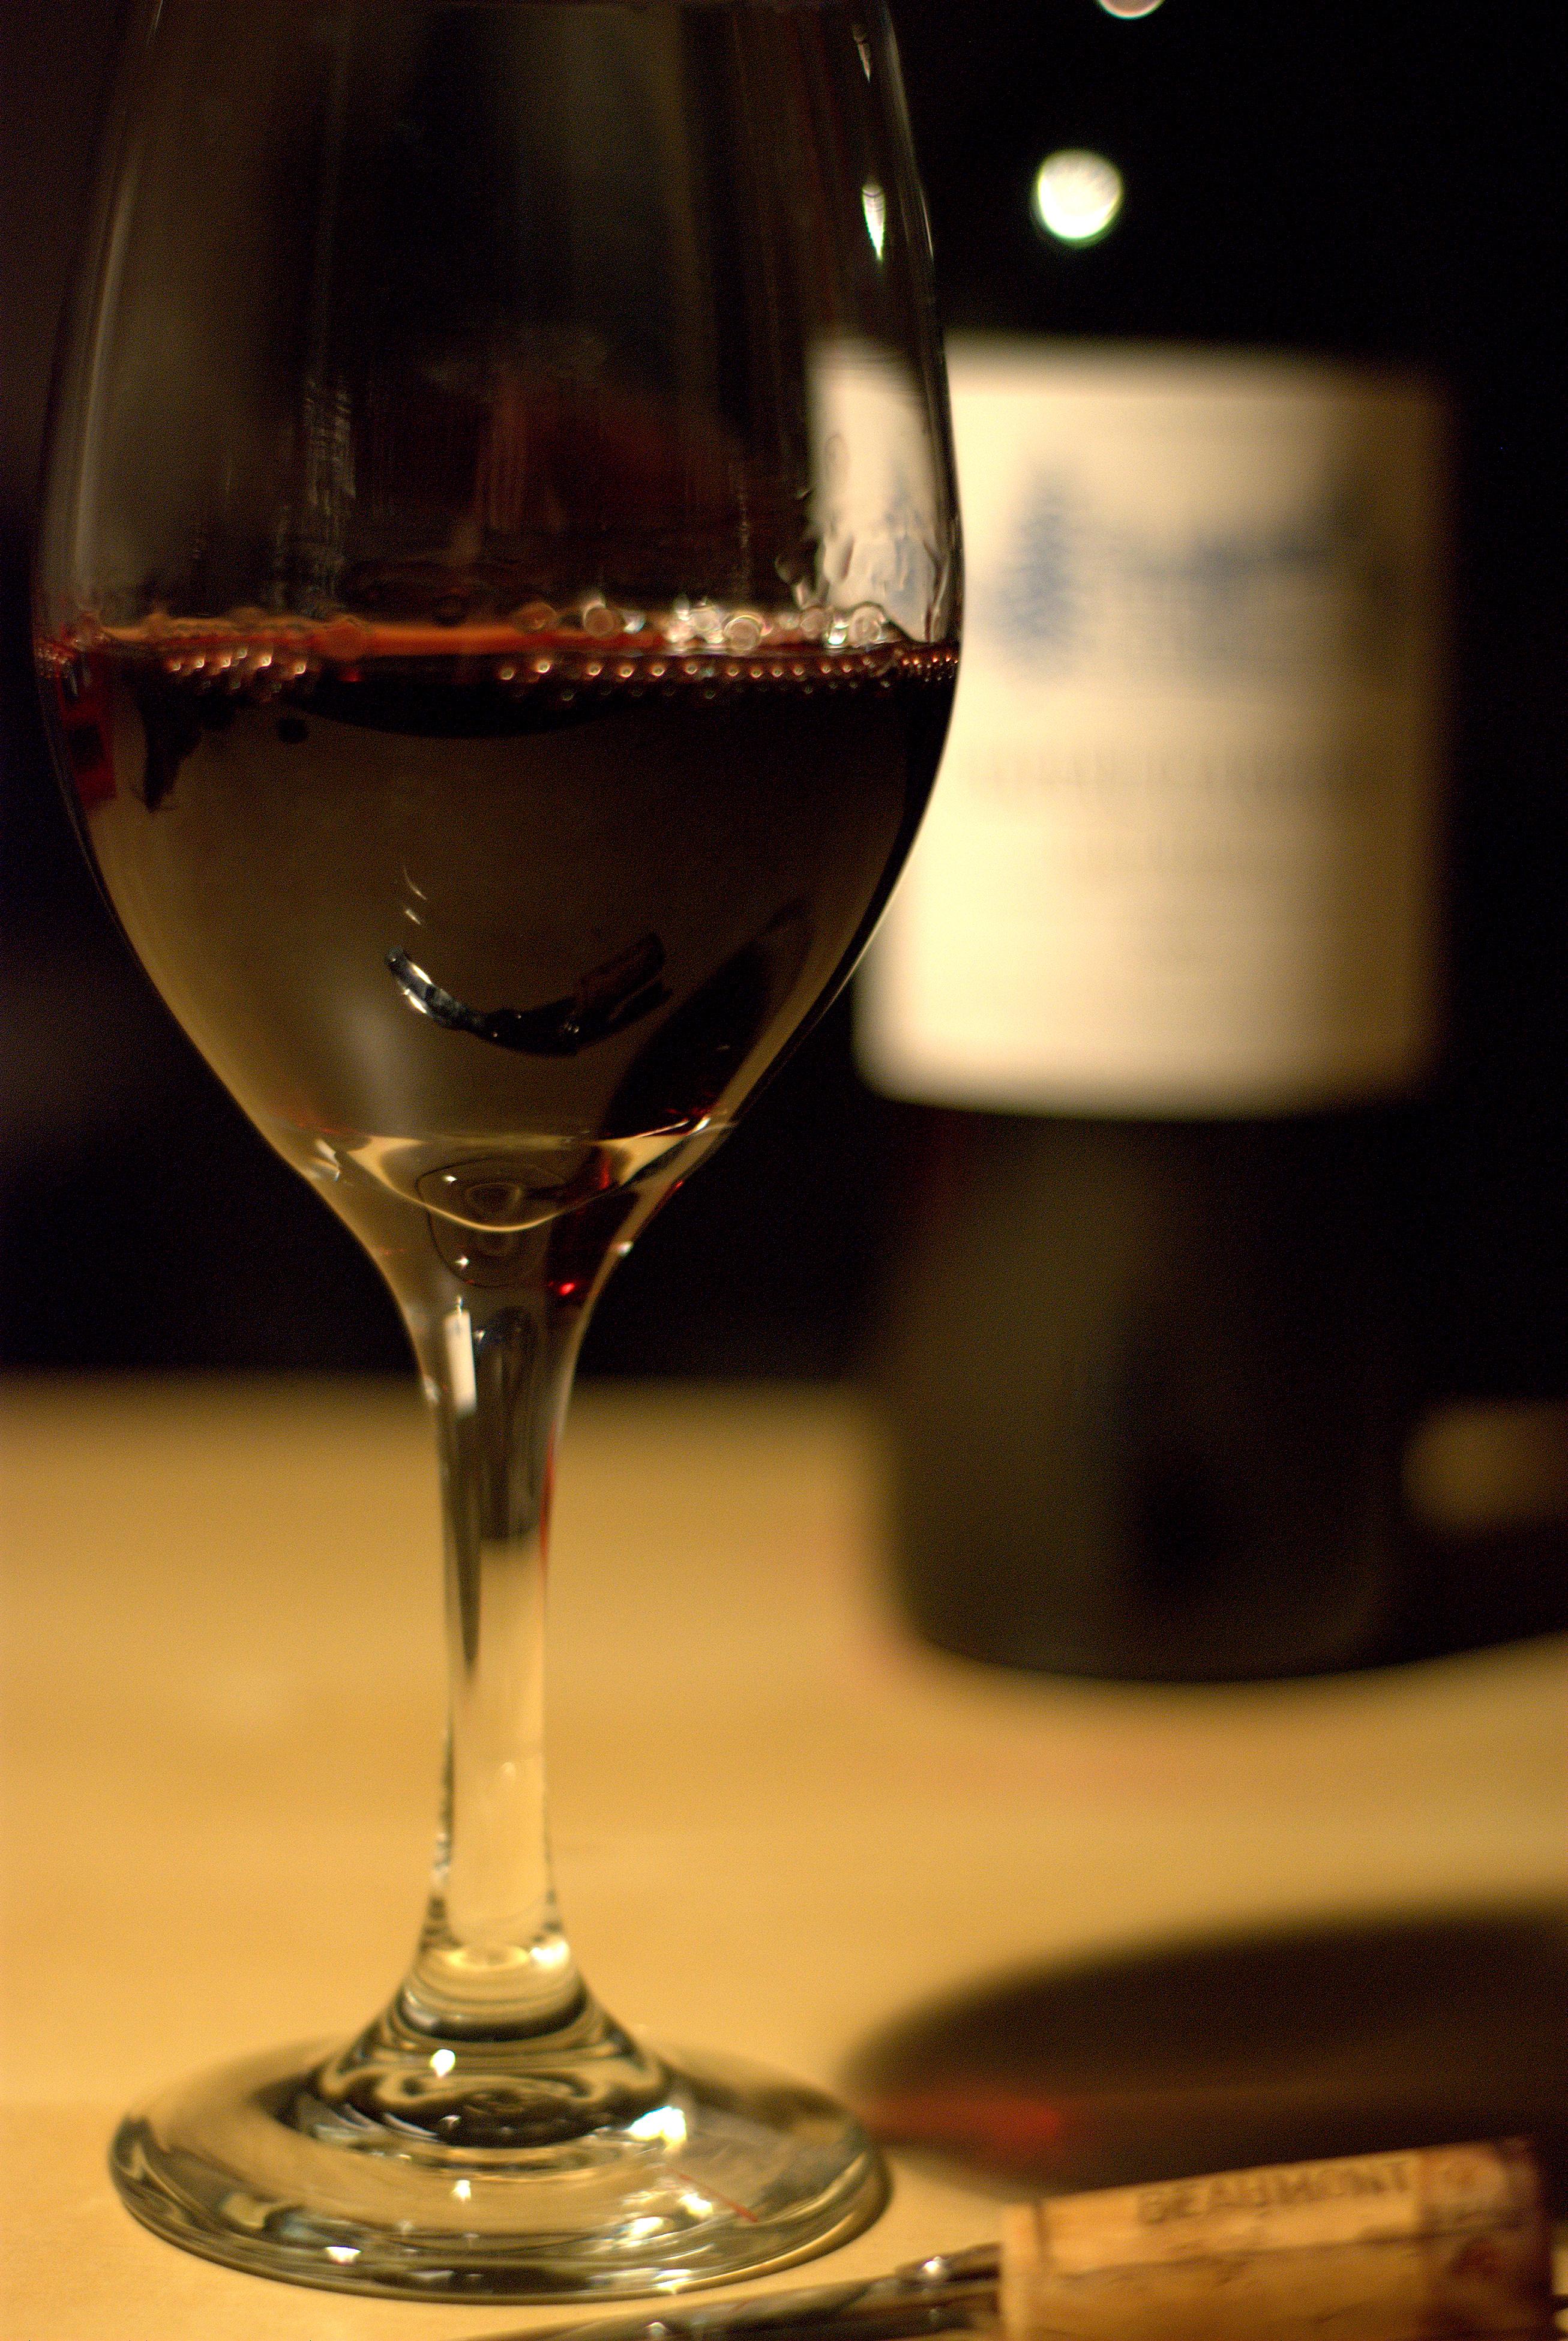 12048_wine.jpg